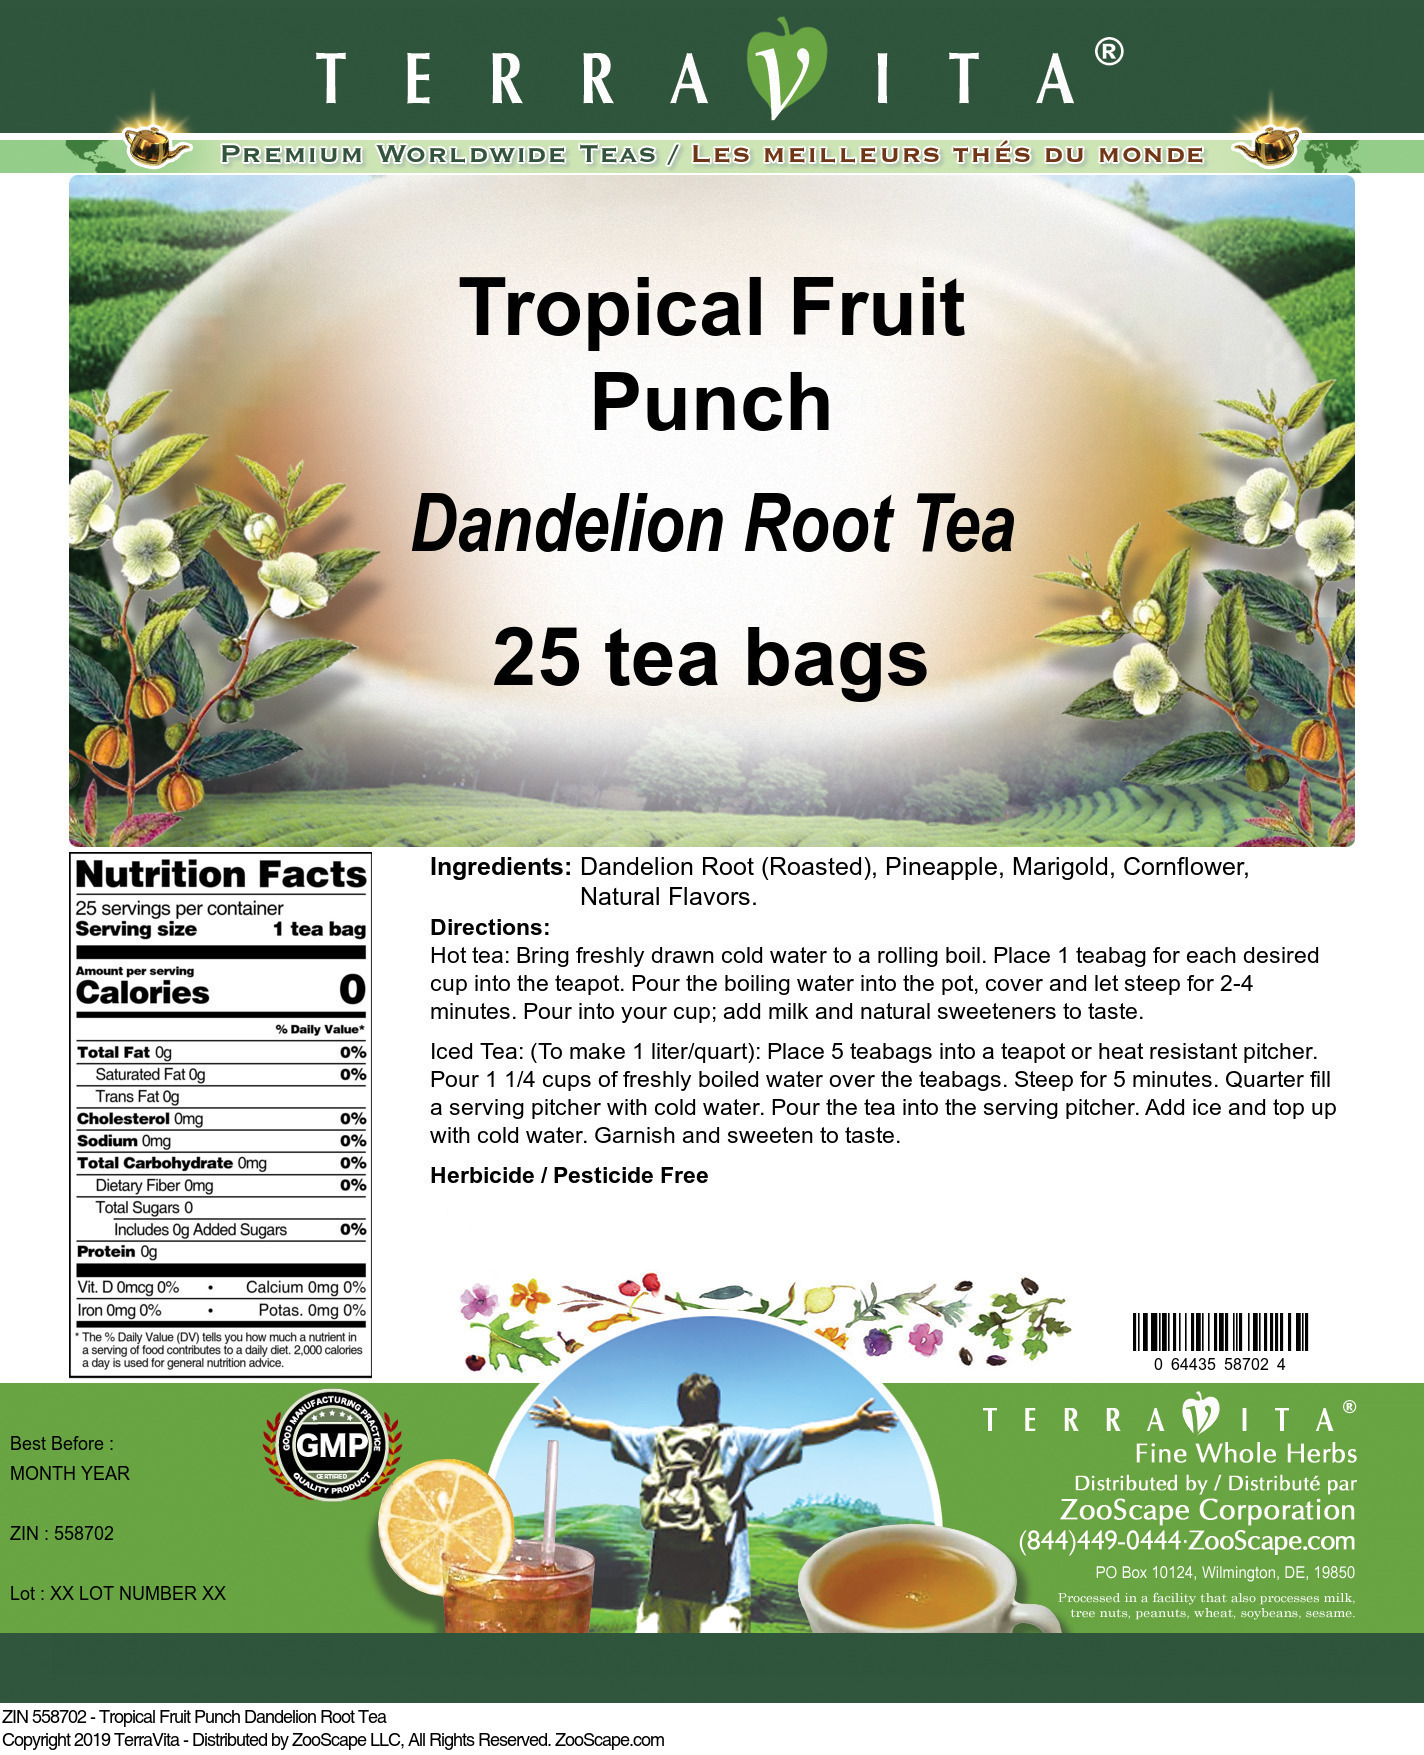 Tropical Fruit Punch Dandelion Root